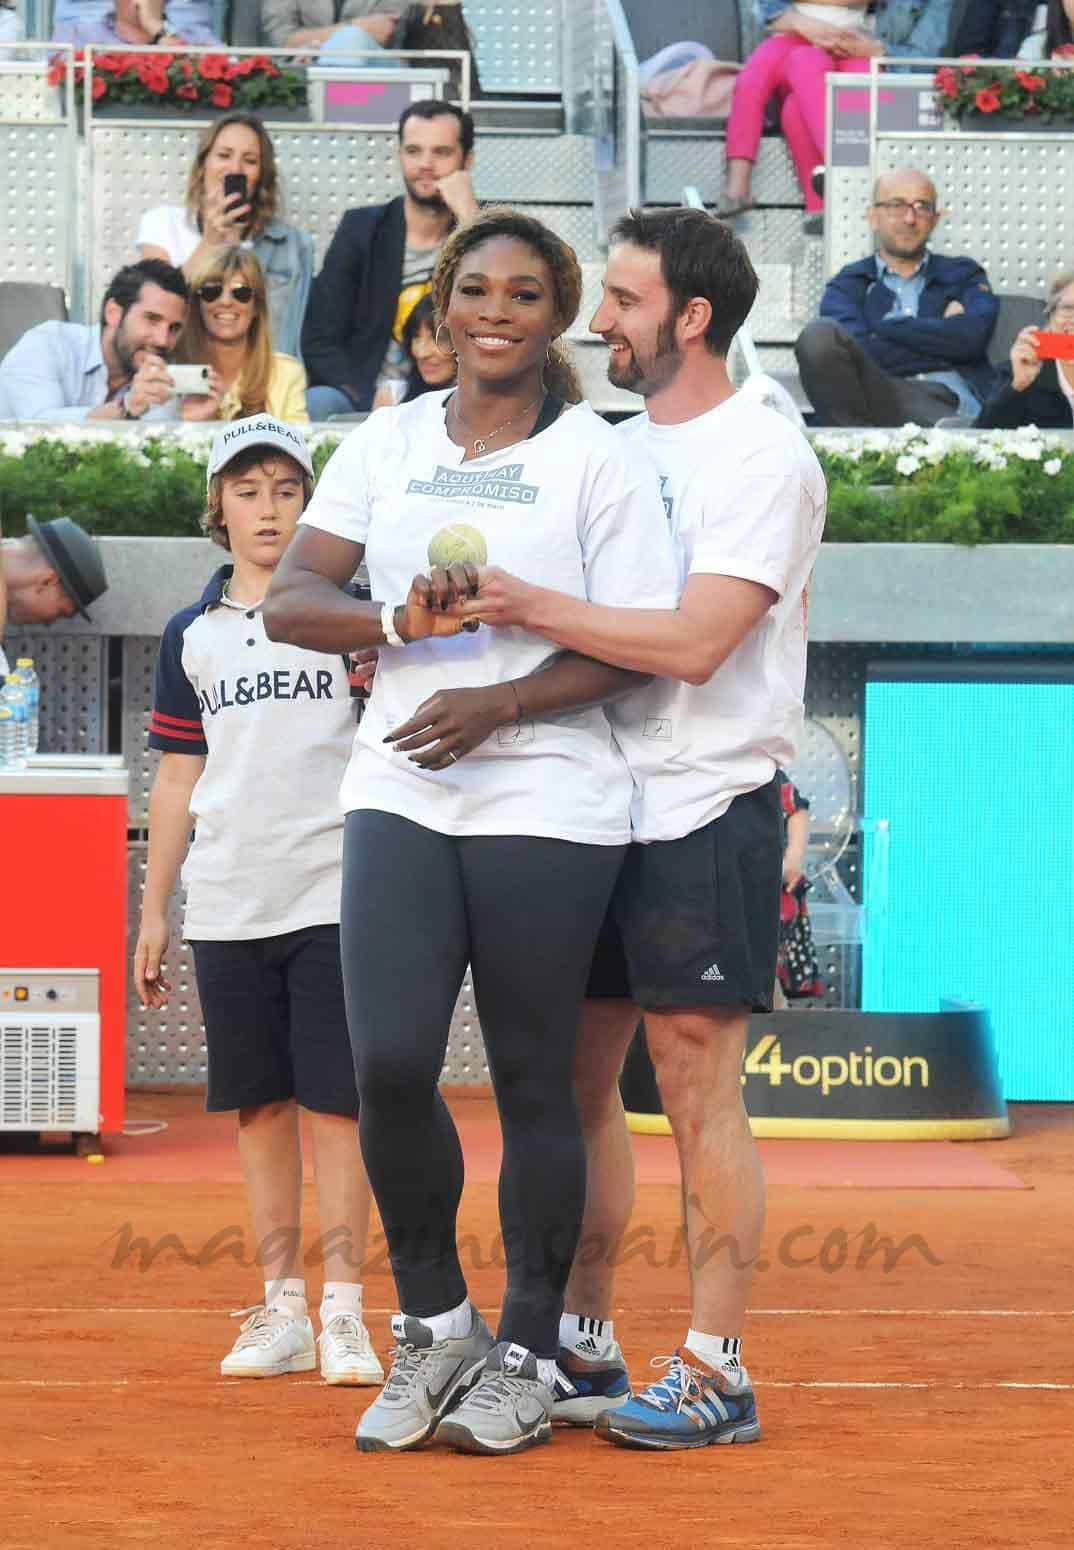 ¿Cuánto mide Dani Rovira? - Altura Dani-Rovira-y-Serena-Williams